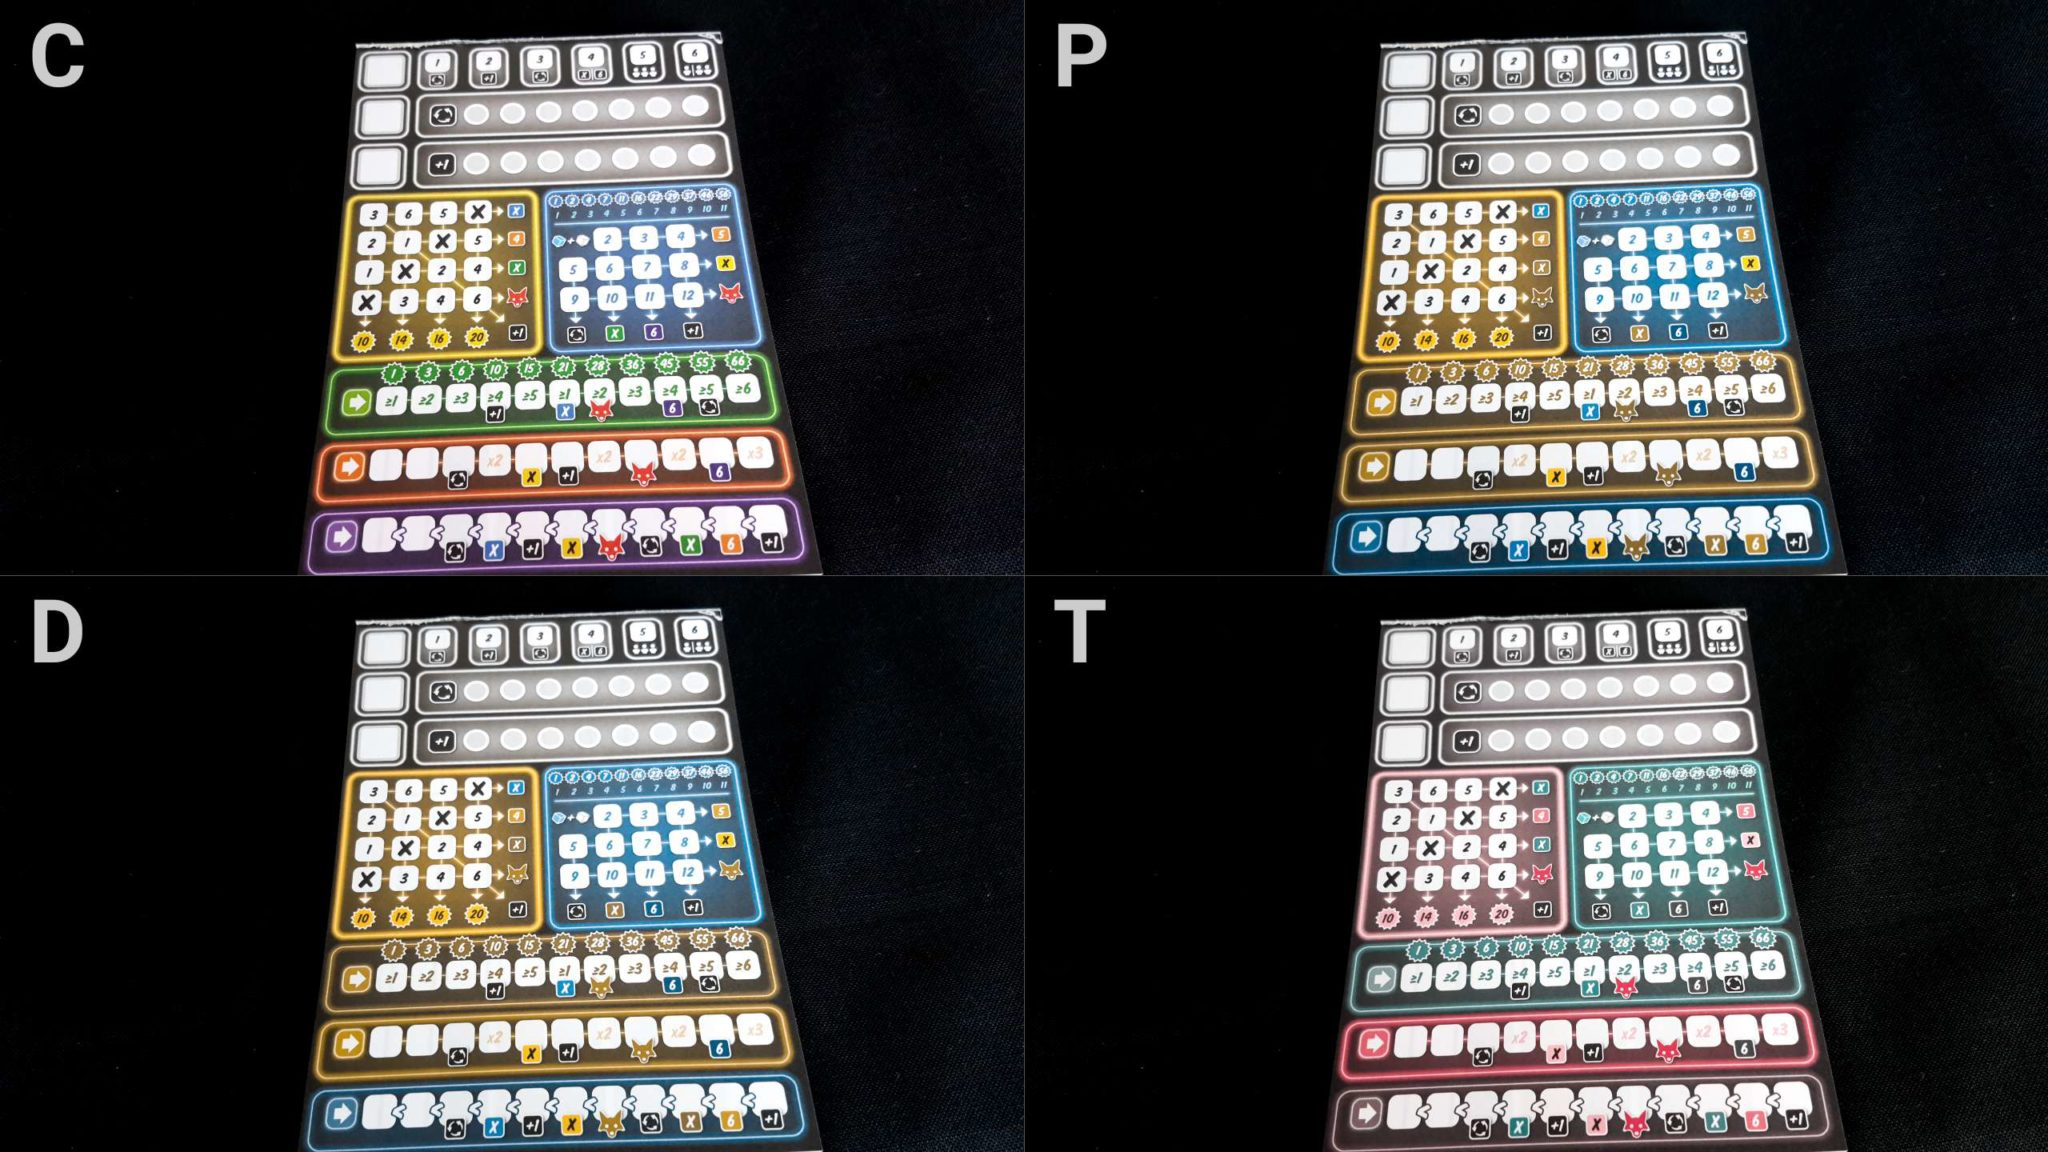 Colour blindness sheets